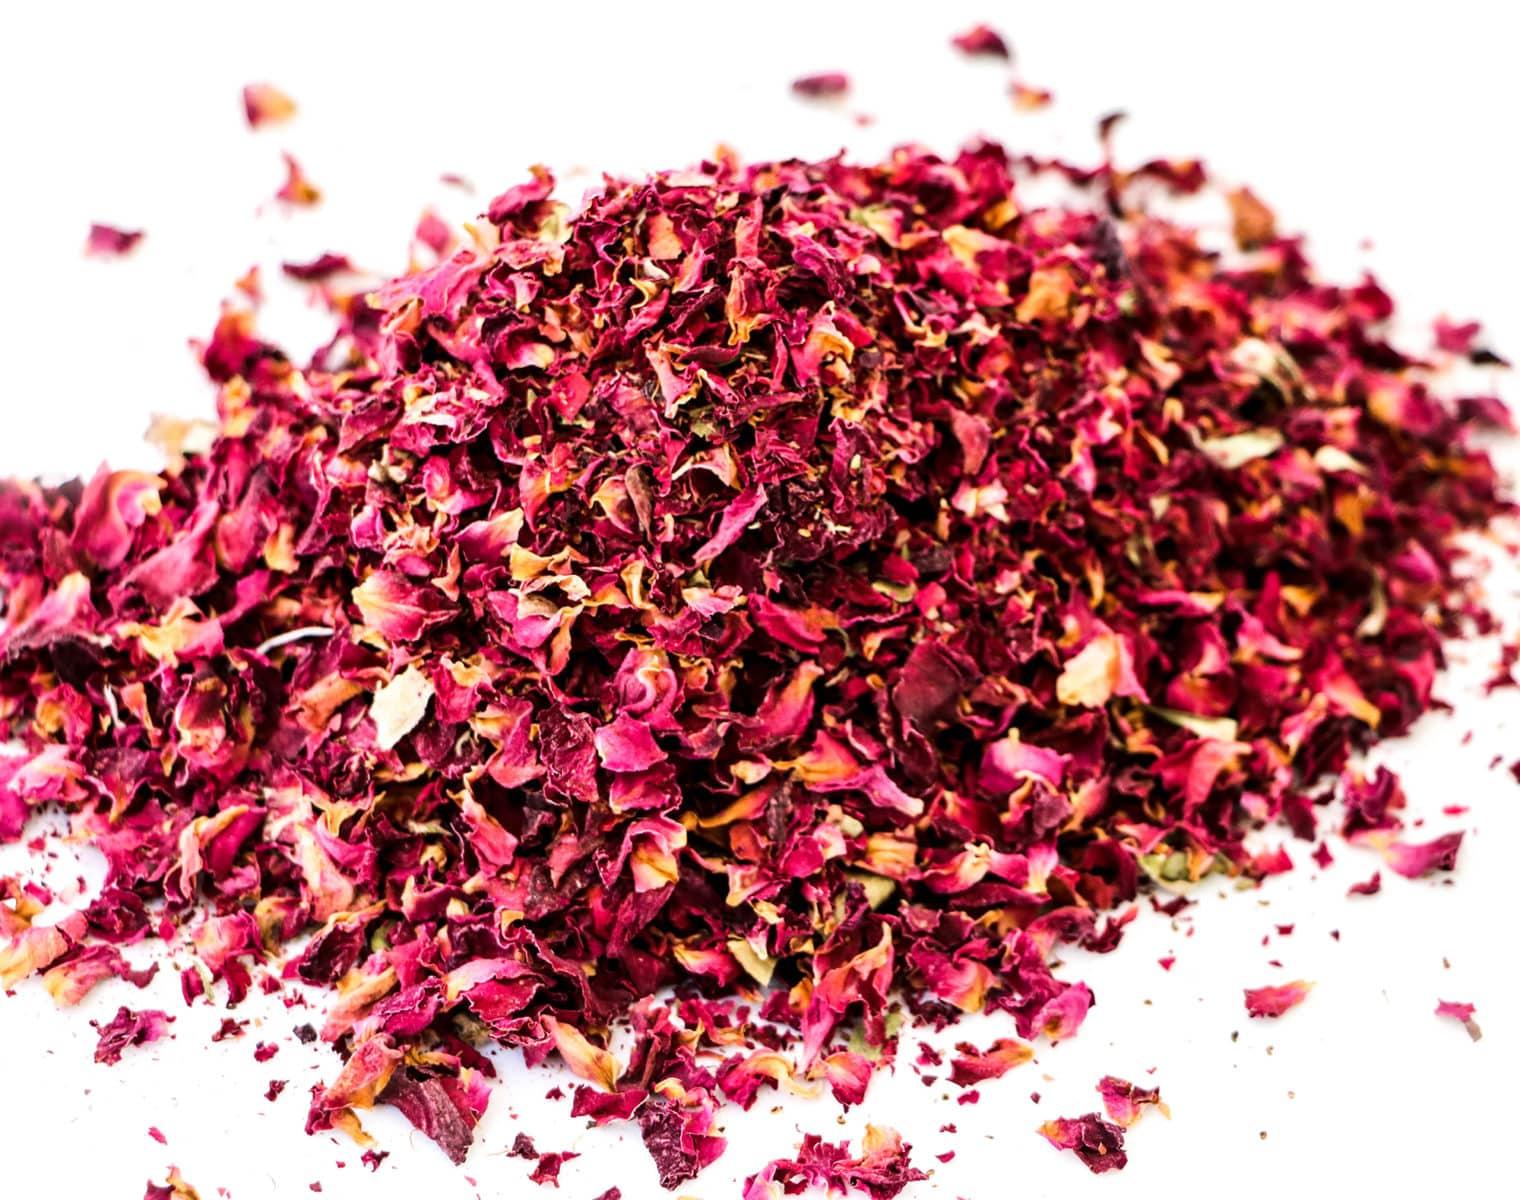 dry rose petals